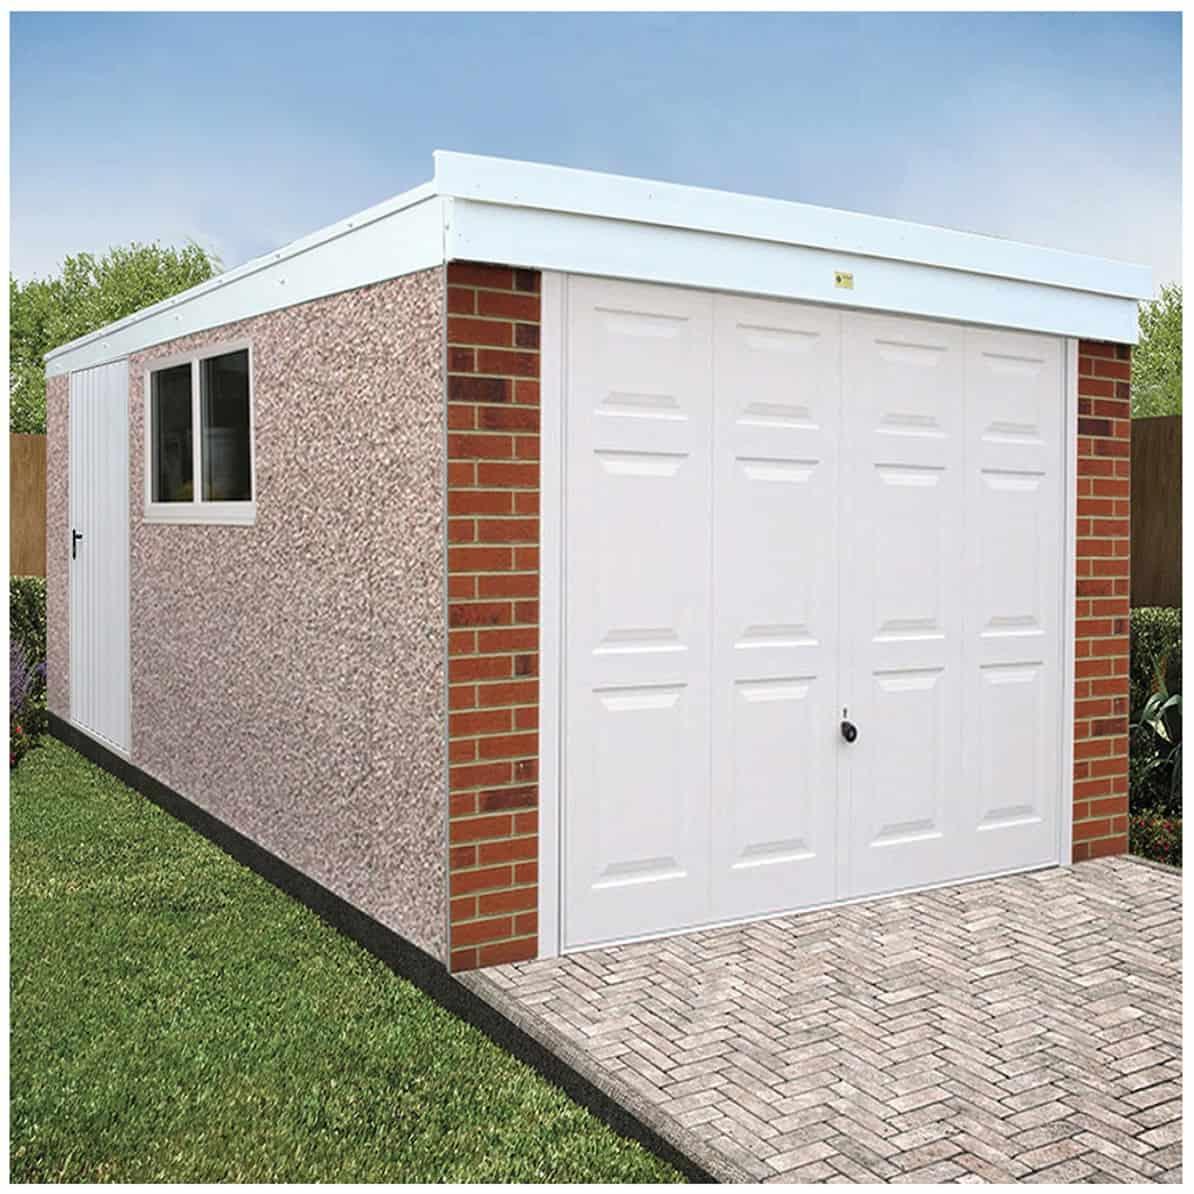 Pent Deluxe Concrete Garage by LidgetCompton